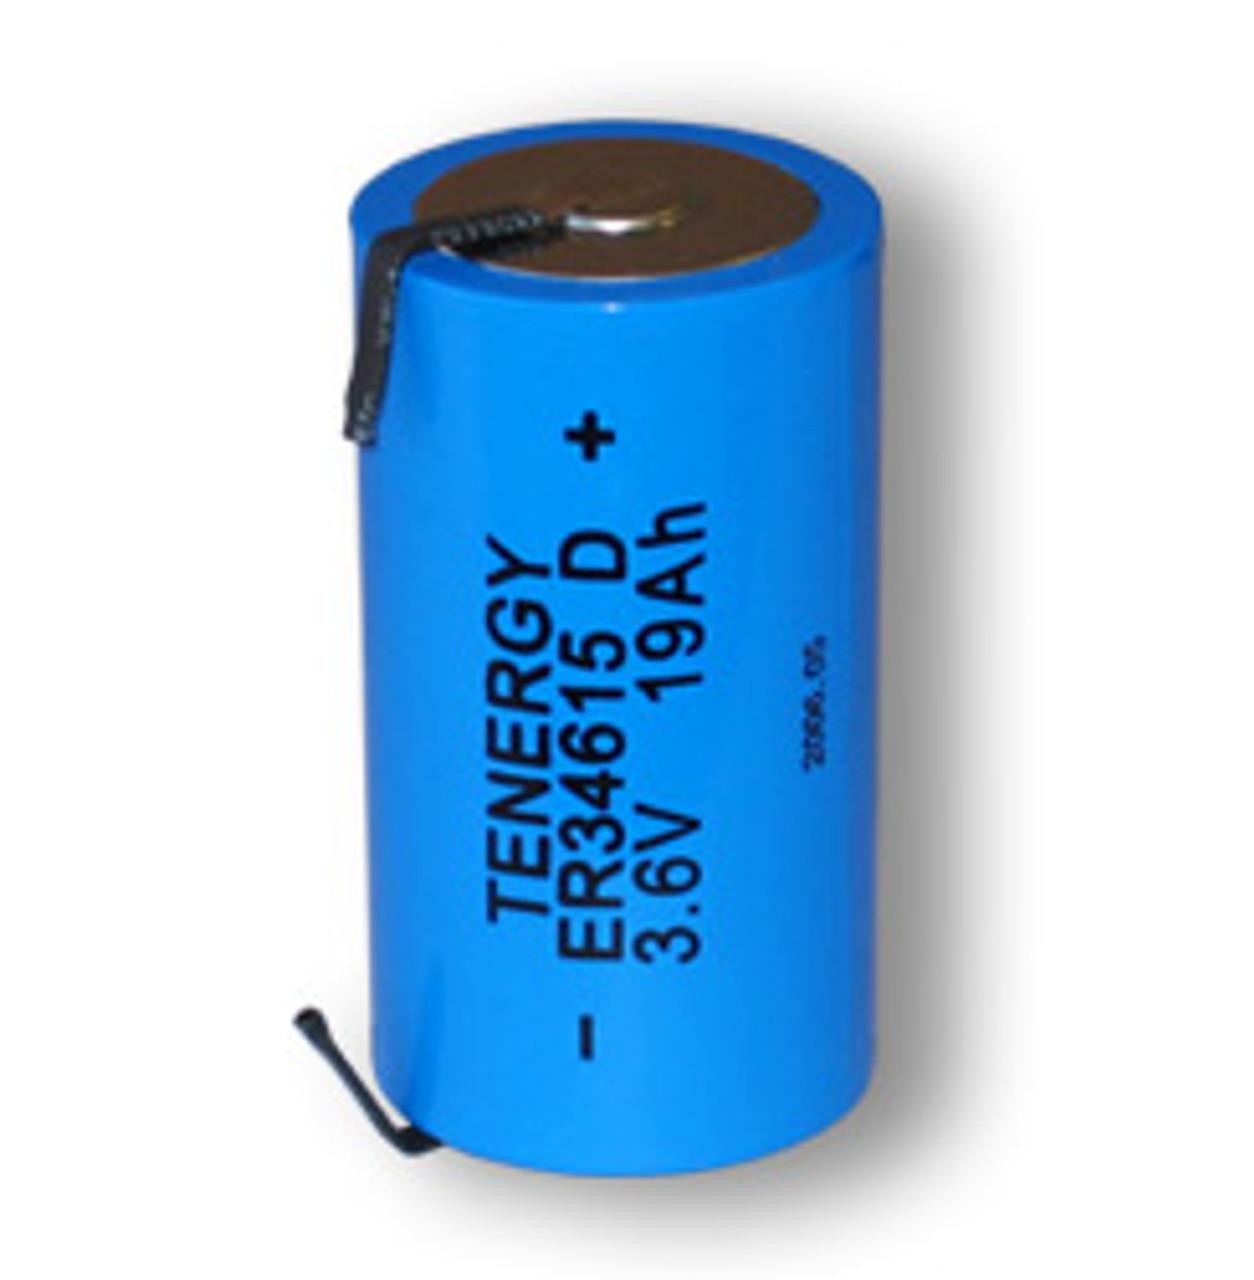 Primary High Energy Lithium Thionyl chloride Battery: D Size 3.6V 19 Ah (ER34615,  SAFT LSH20 )  (non Rechargeable) (DGR)